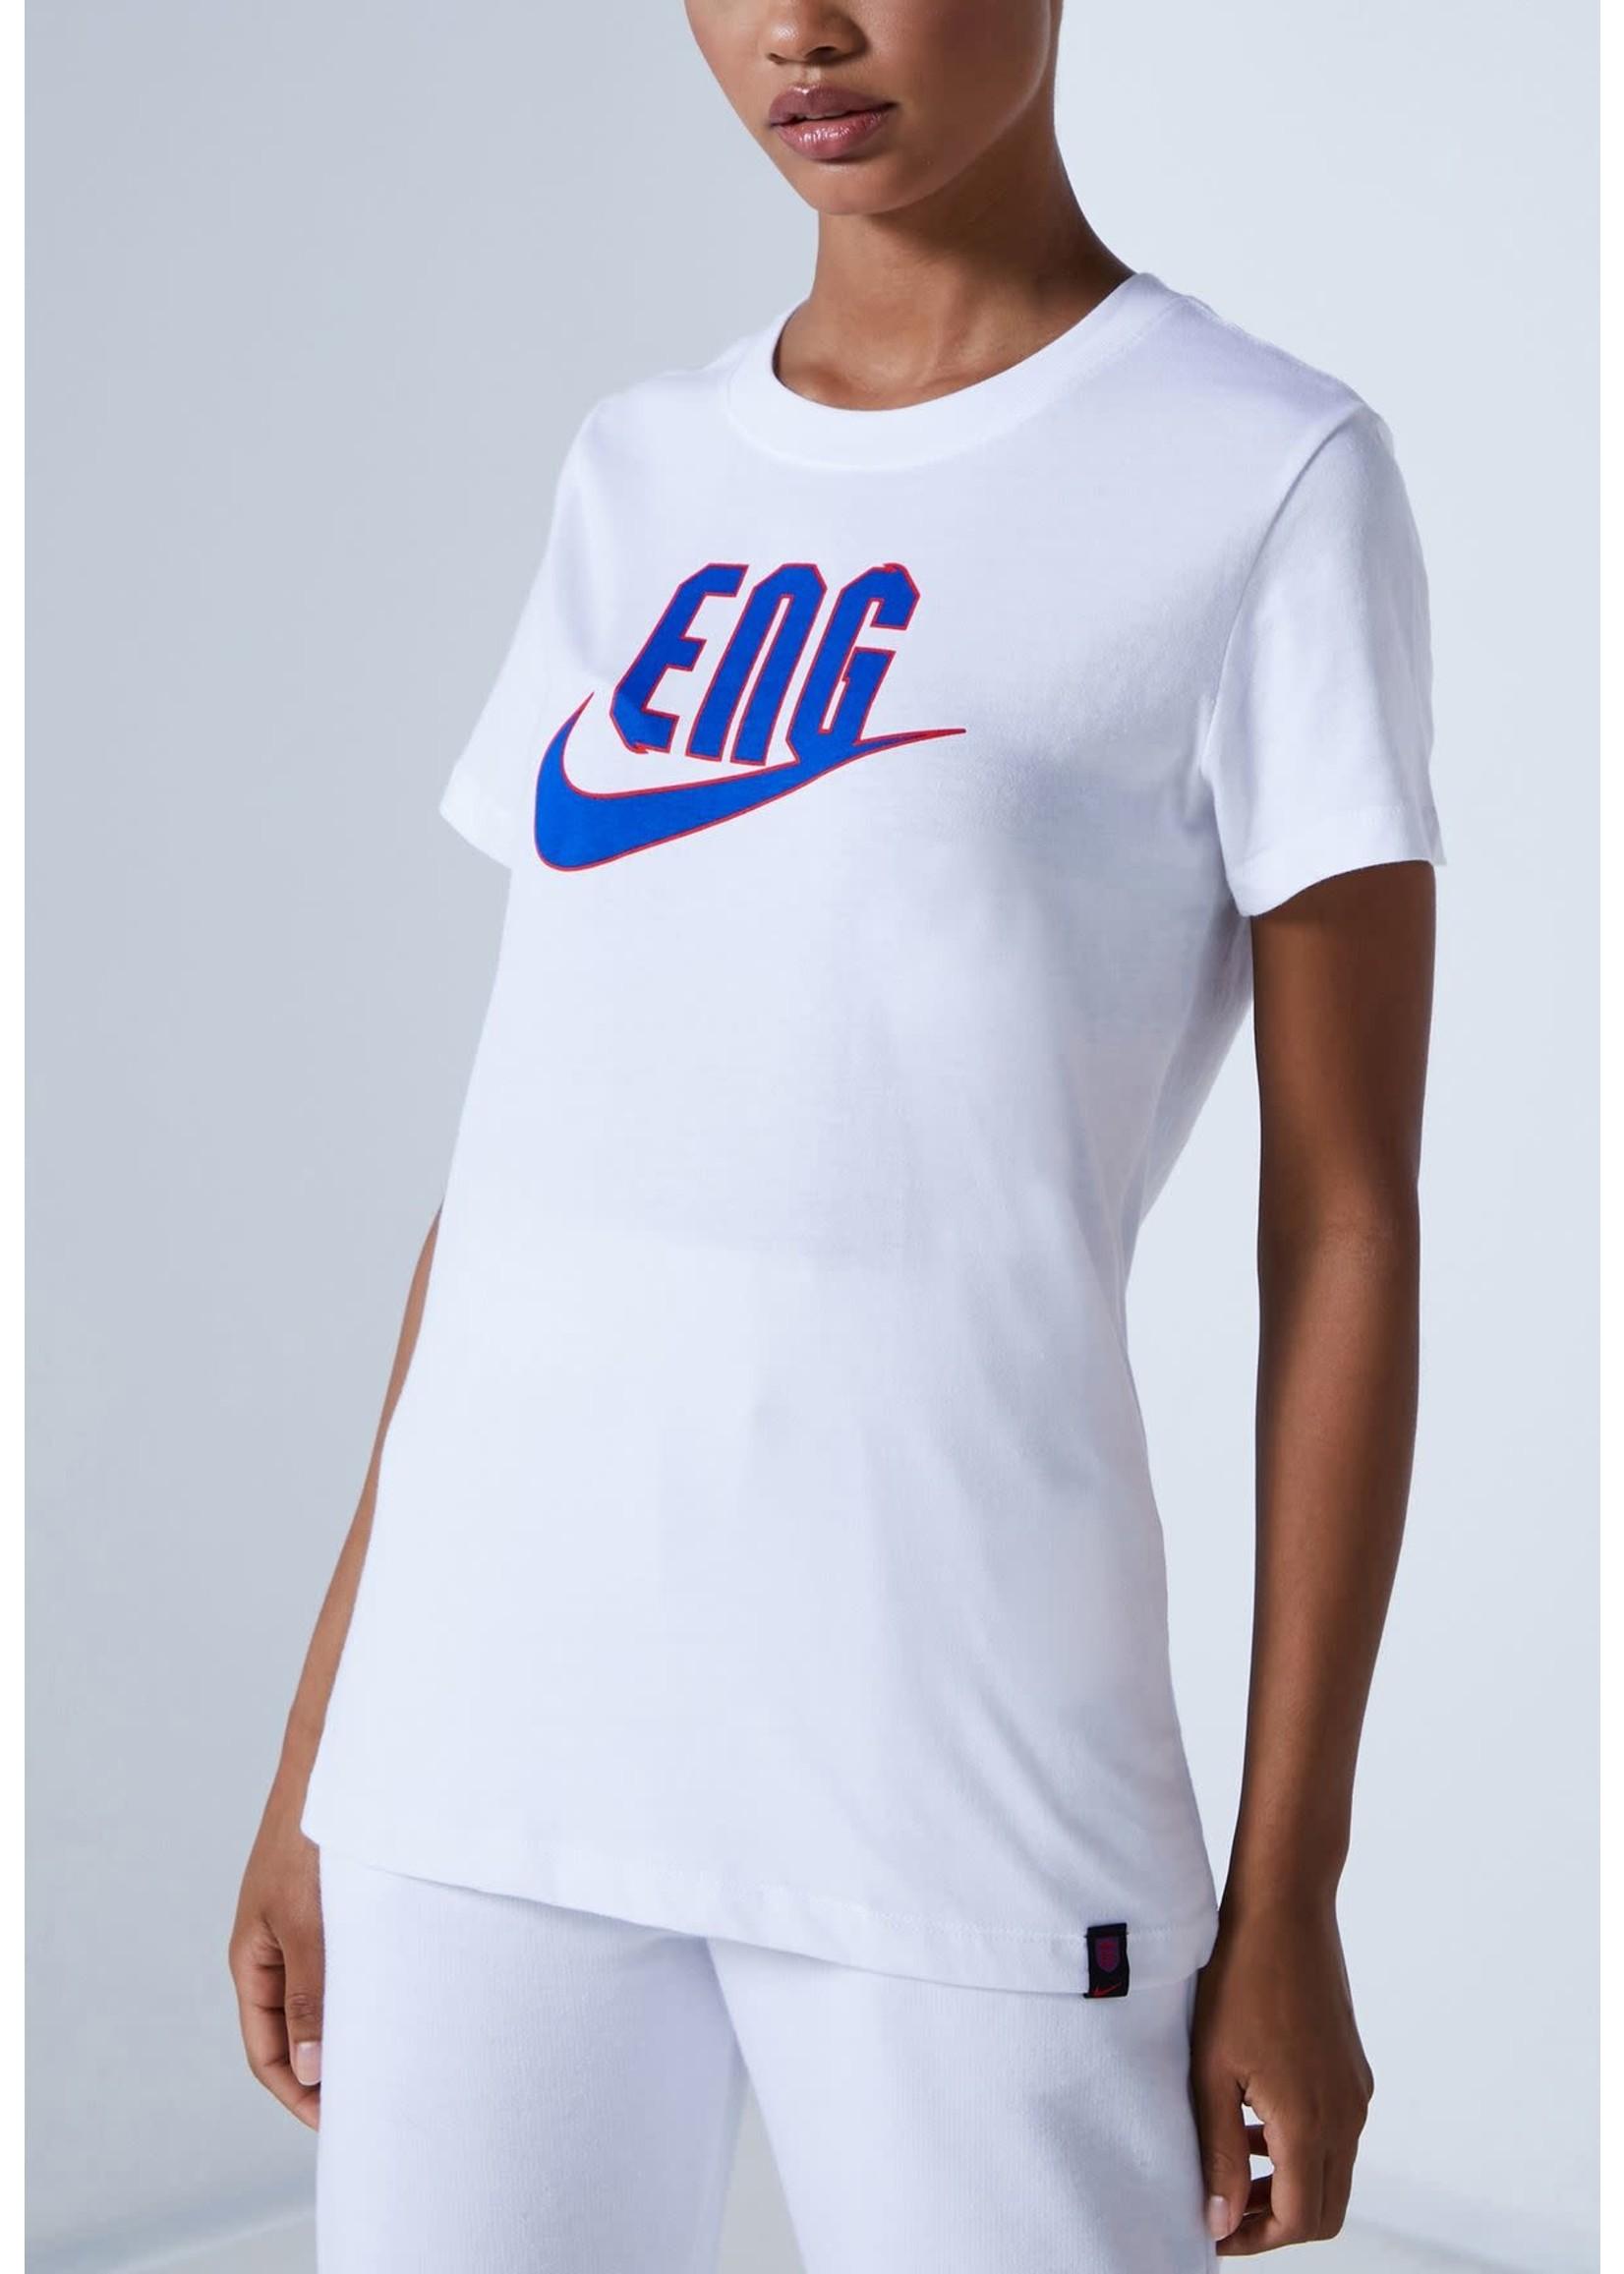 Nike England T-Shirt - Womens - CD1443-100